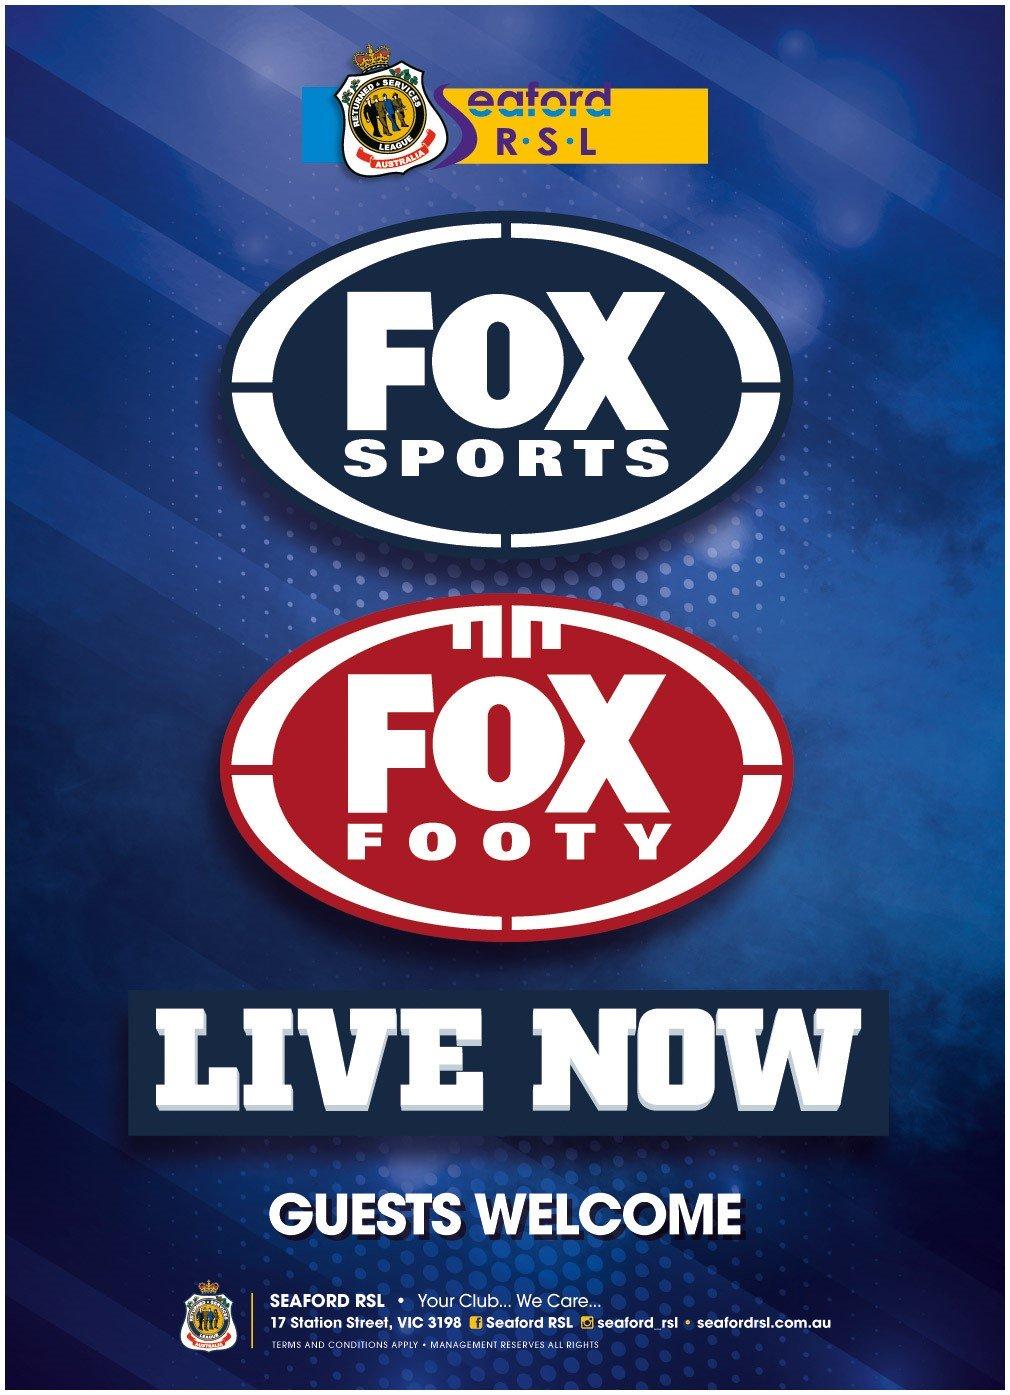 Fox Sports Now Live Seaford Rsl